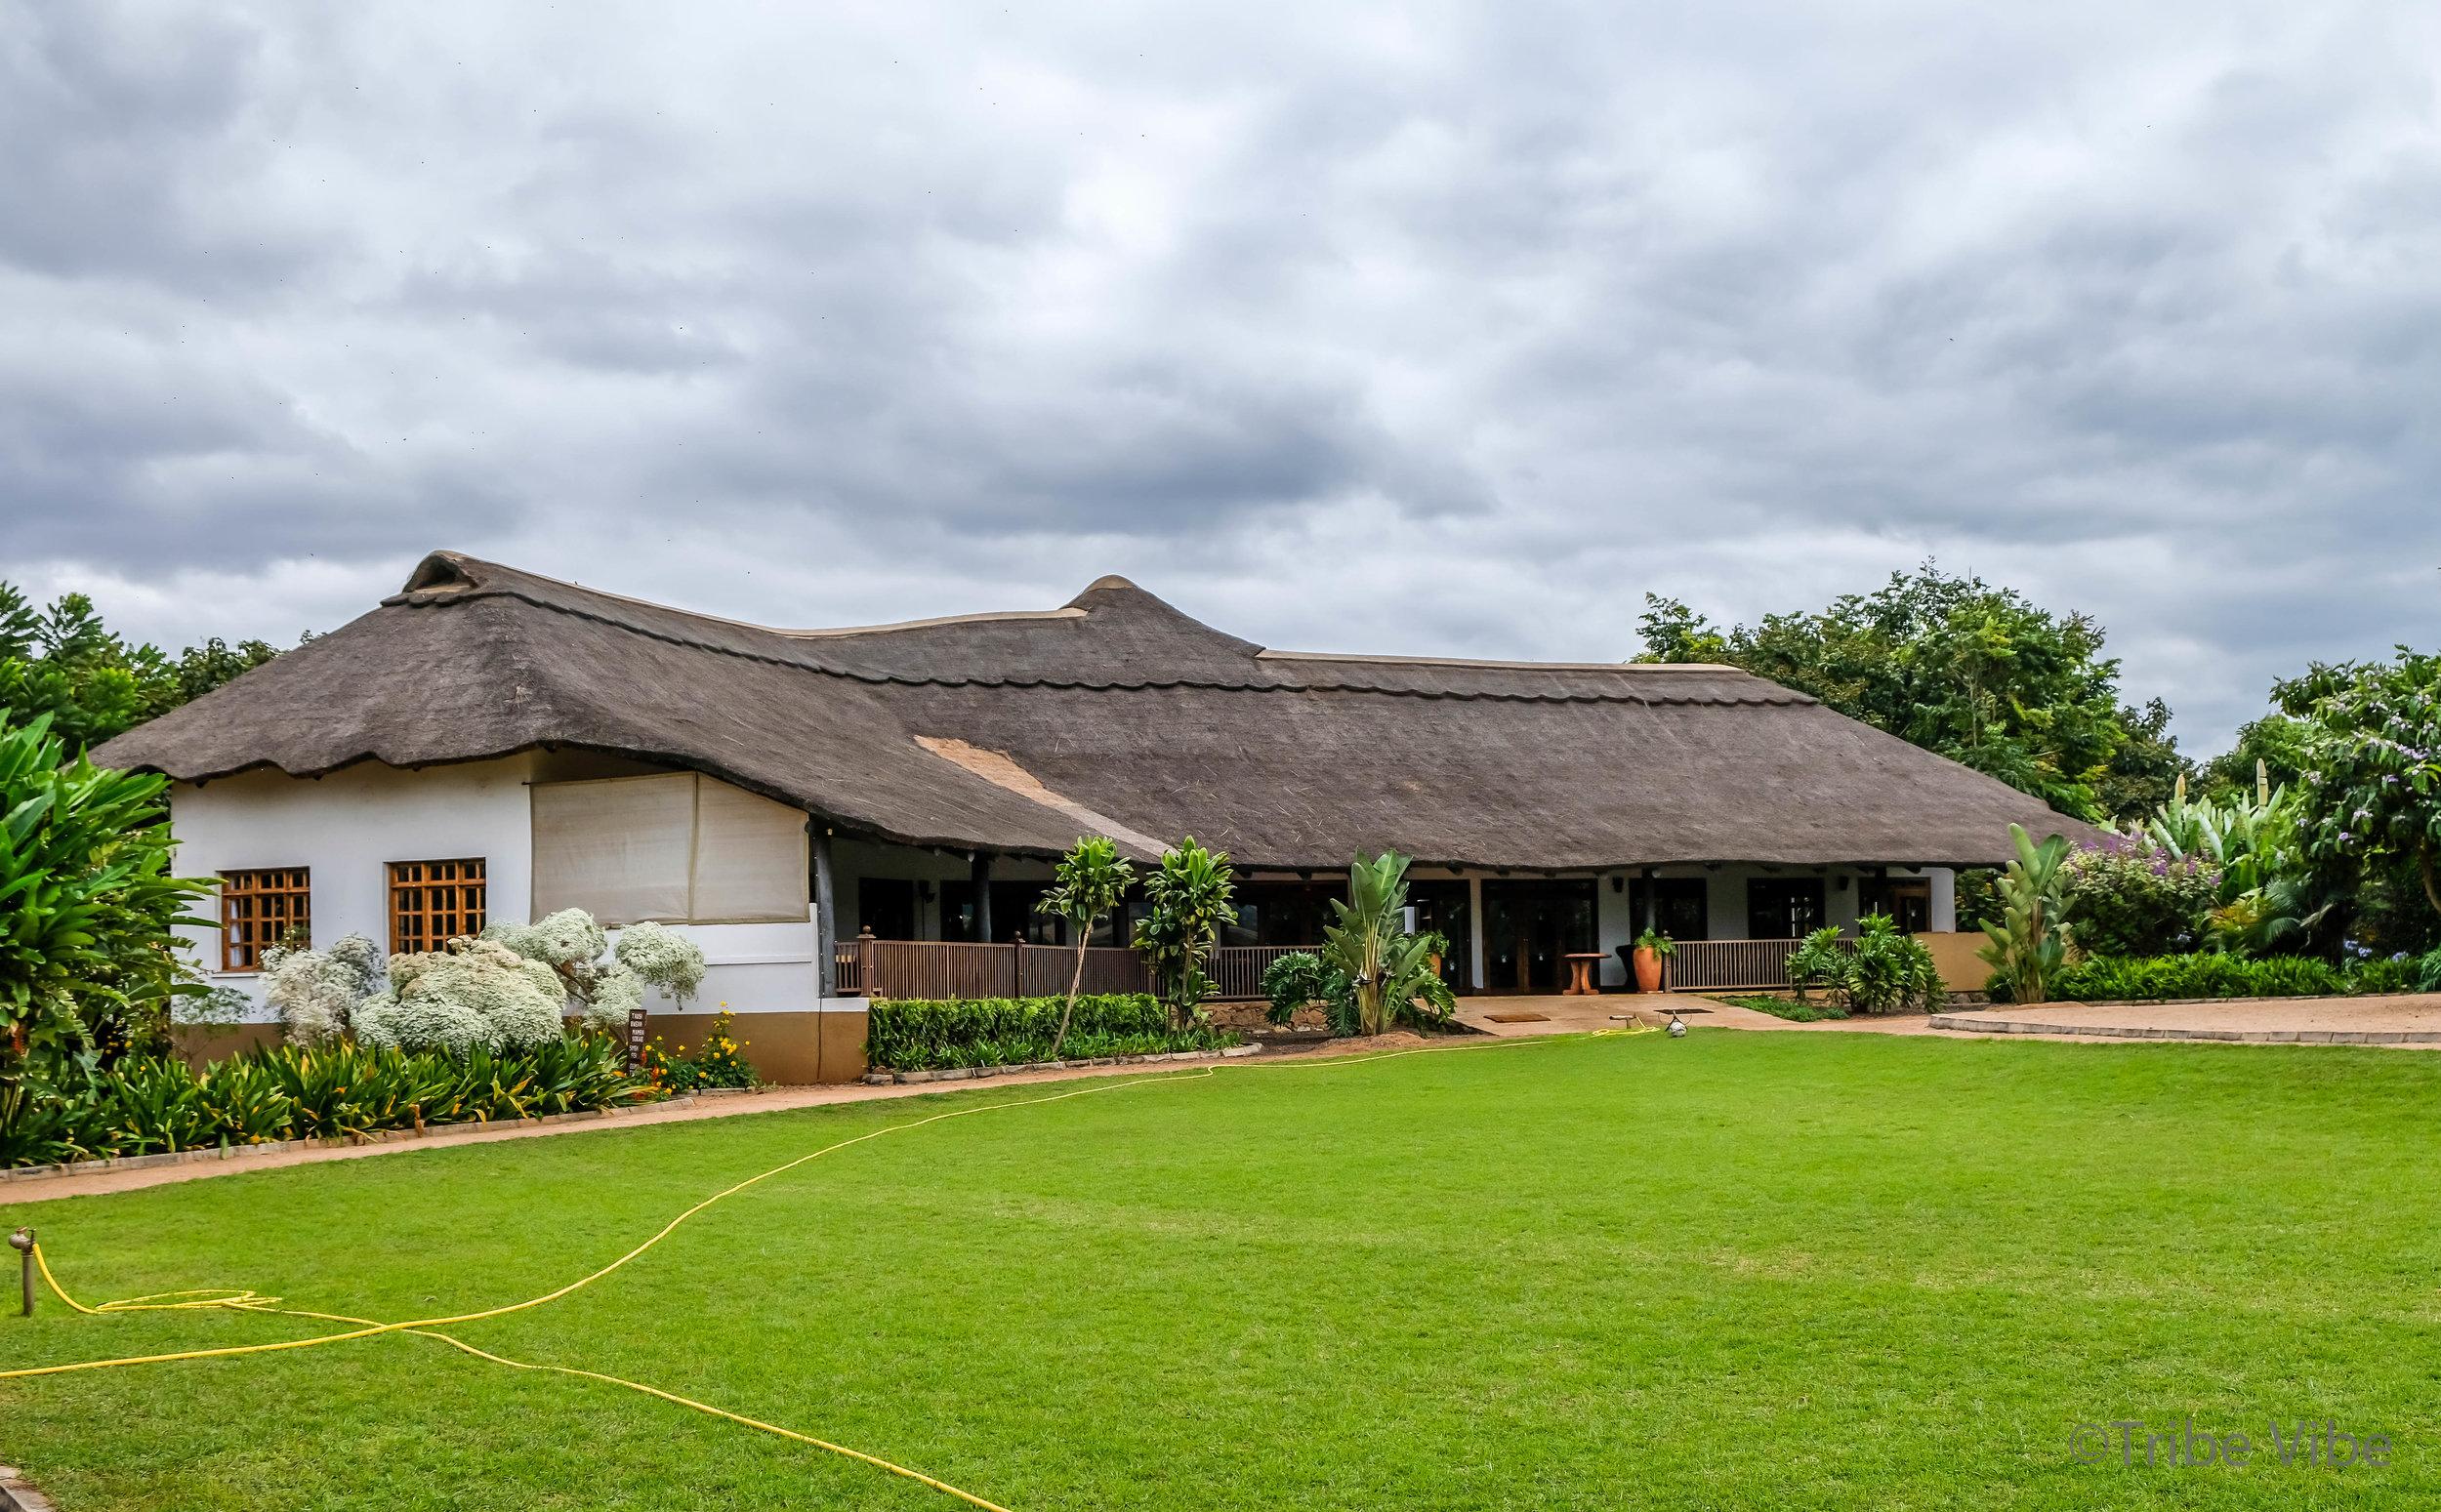 farm house valley3.jpg